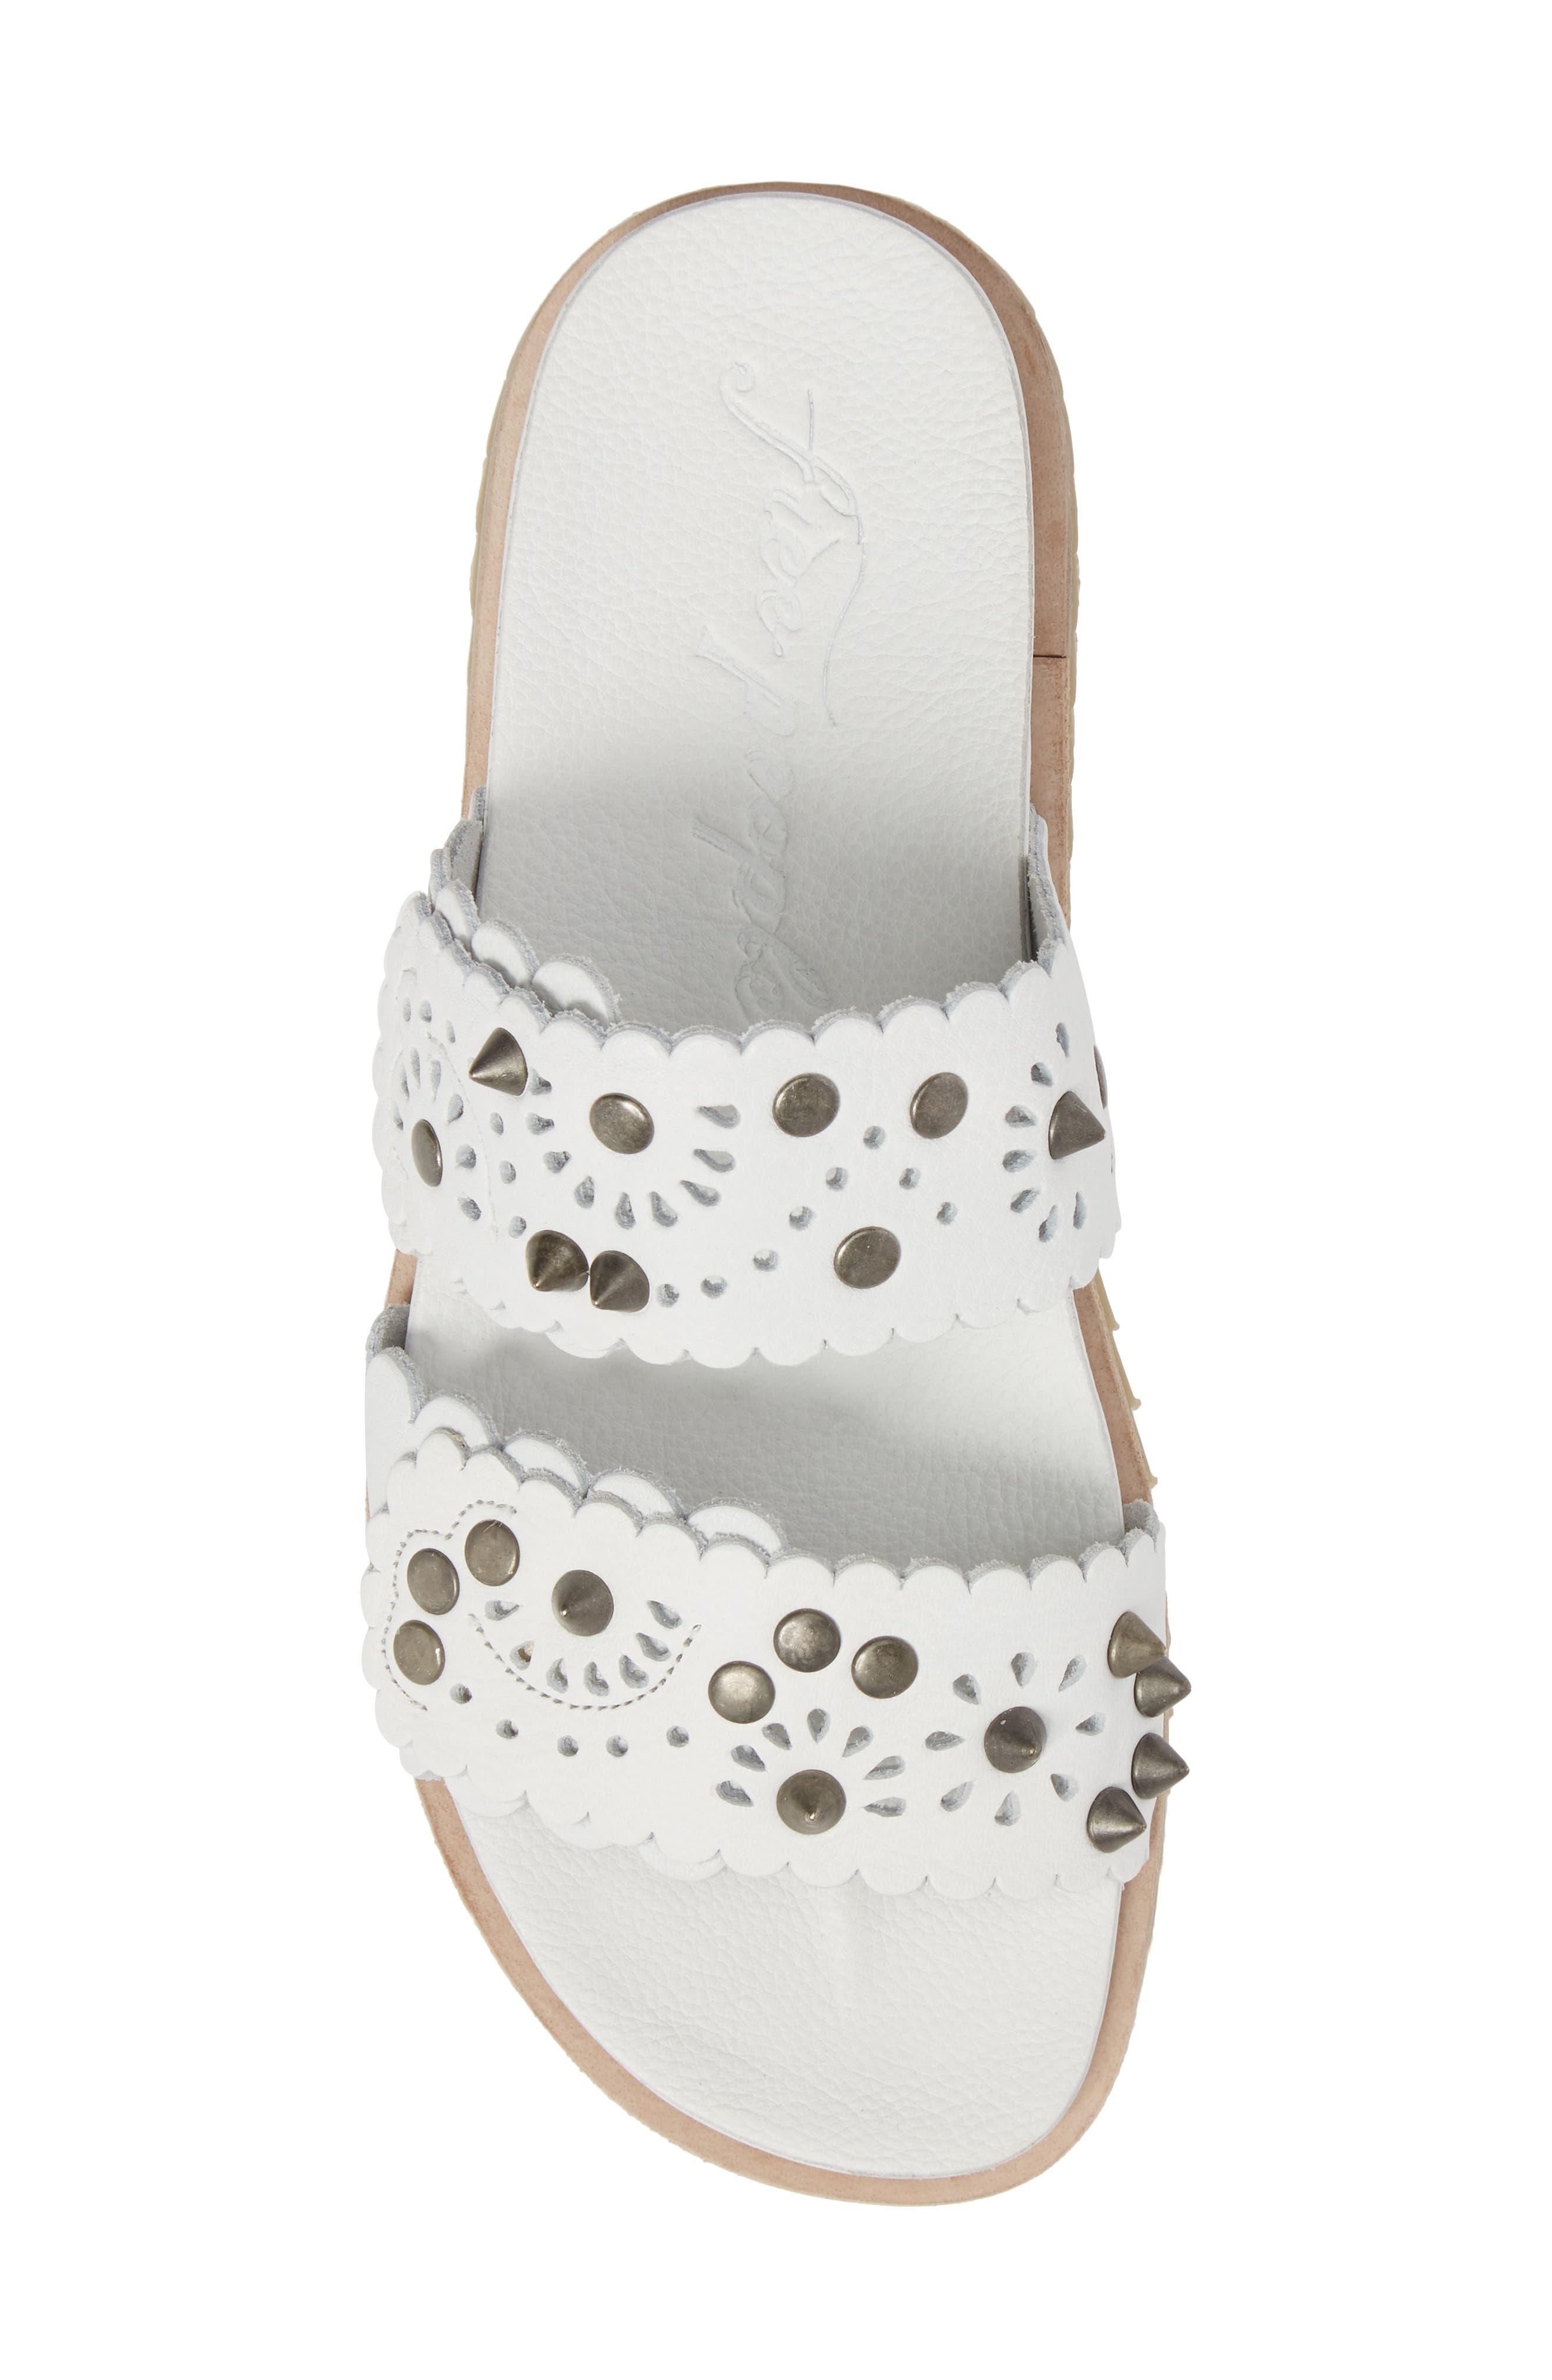 Spellbound Embellished Slide Sandal,                             Alternate thumbnail 5, color,                             White